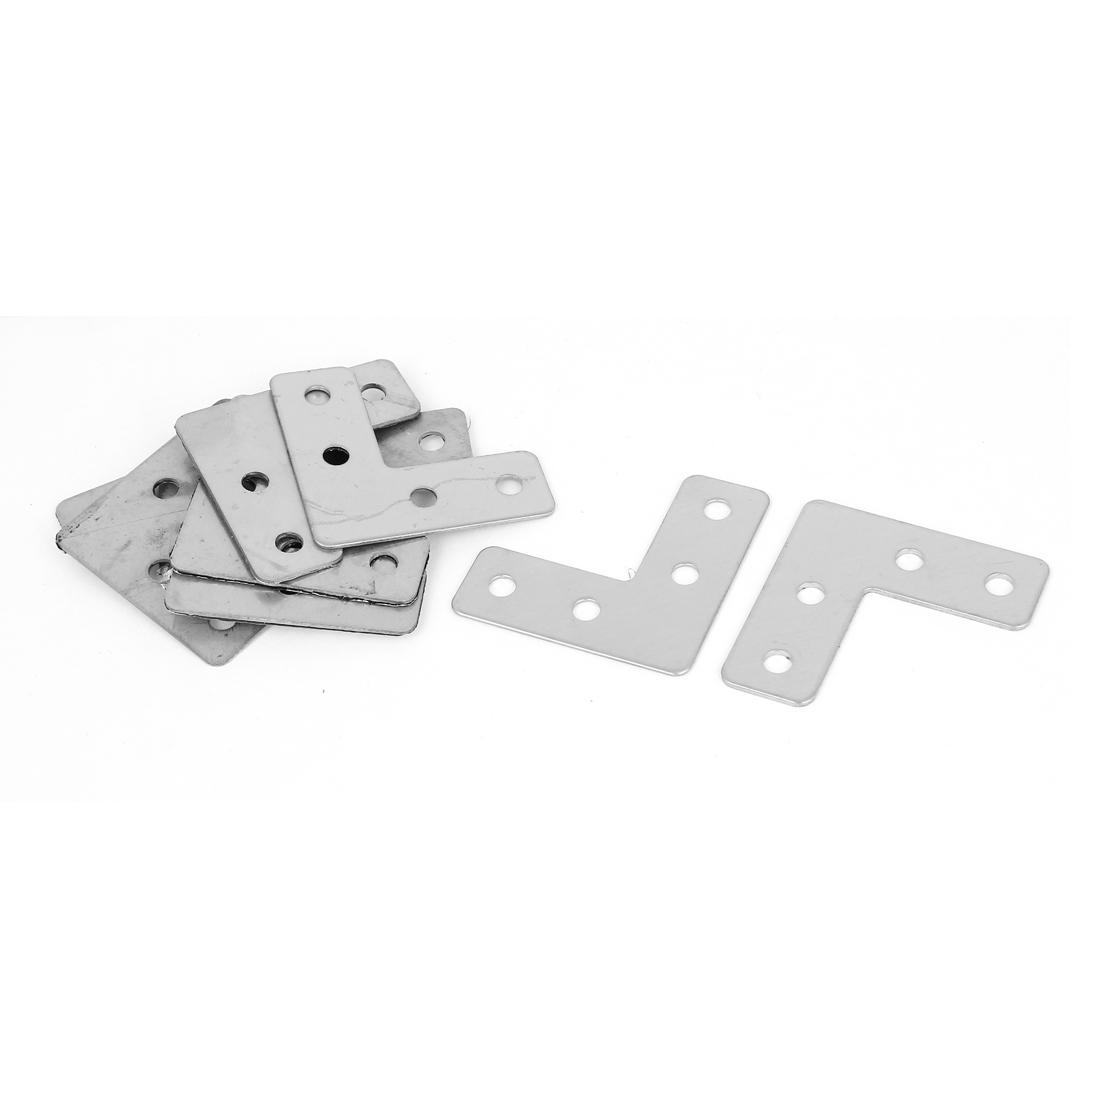 Furniture 40mmx40mm L Shape Right Angle Flat Plate Corner Brace Bracket 10Pcs